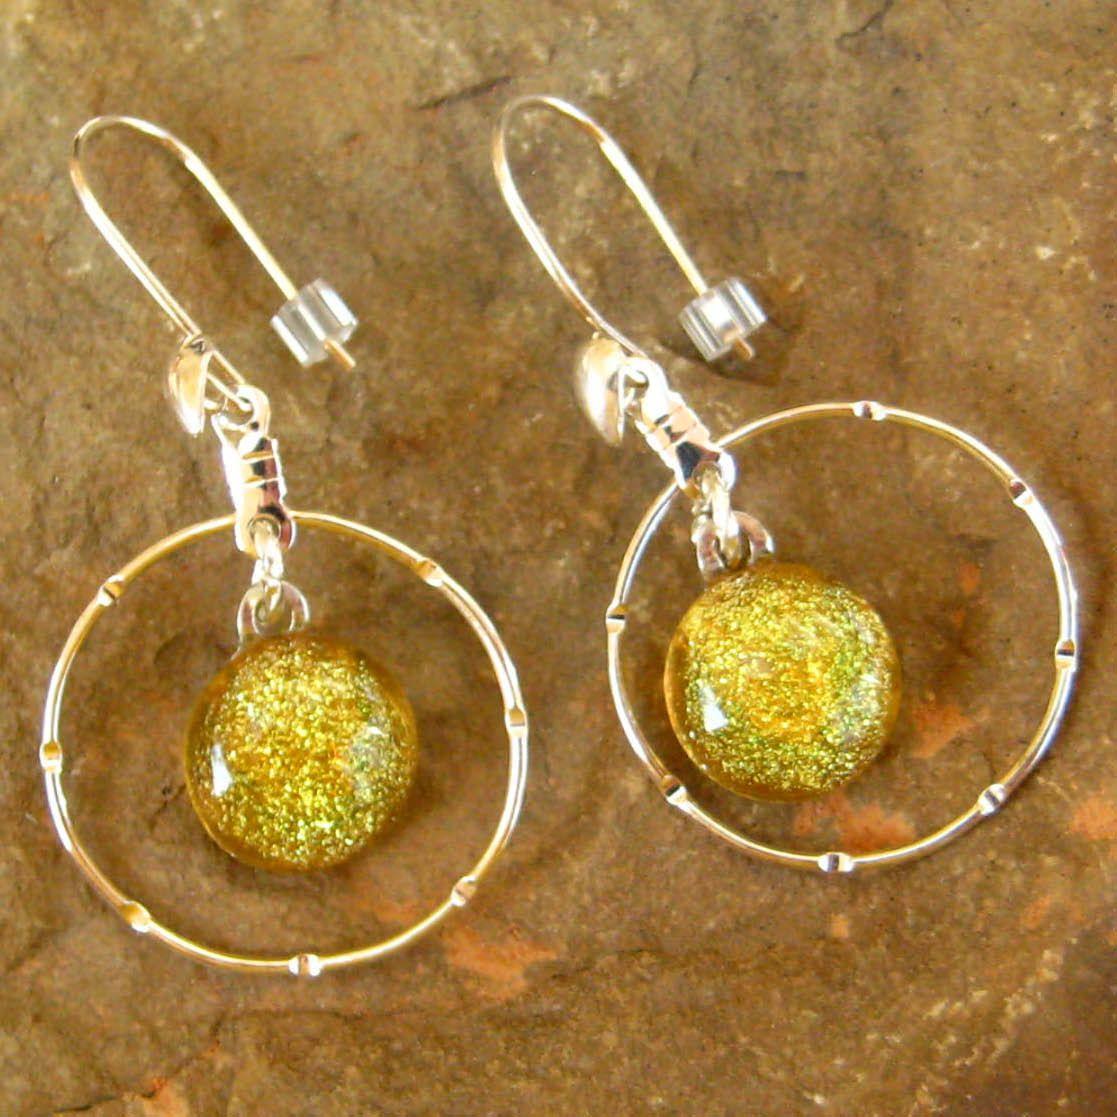 Dichoric Glass Hoop Earrings, Fused Glass Earrings - Sunny Yellow Sparkle